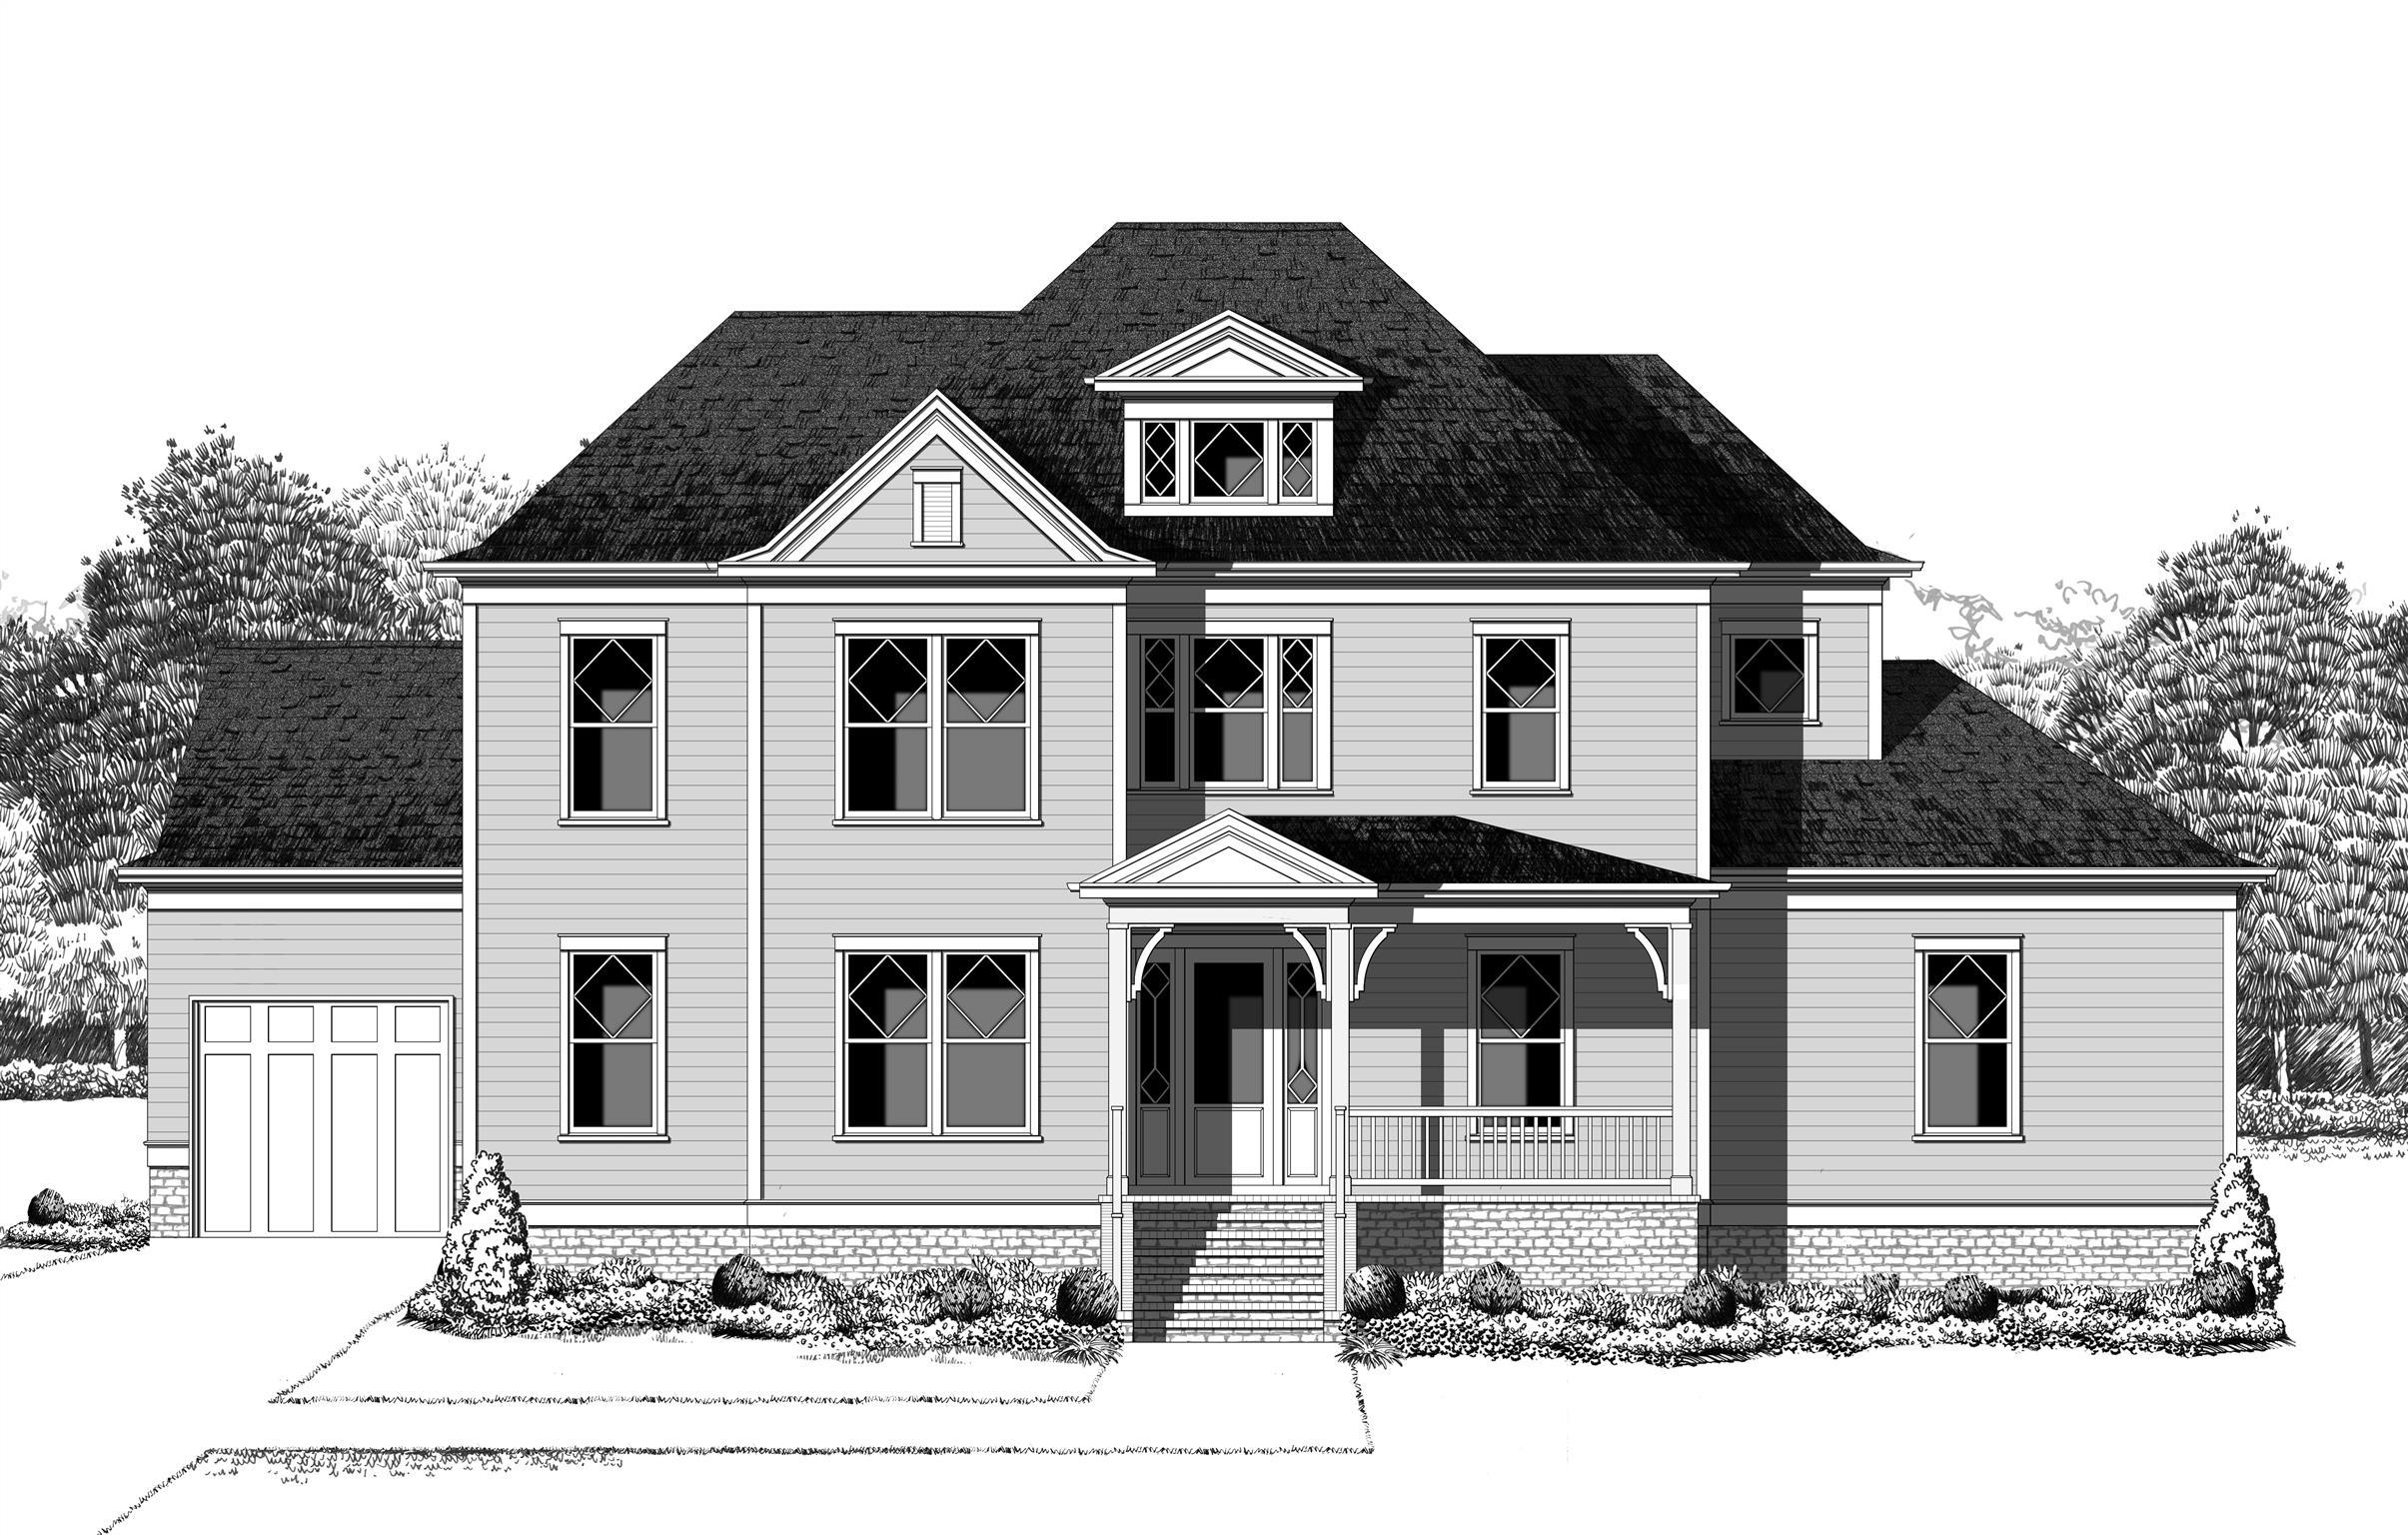 9049 Berry Farms Crossing-7022, Franklin, TN 37064 - Franklin, TN real estate listing